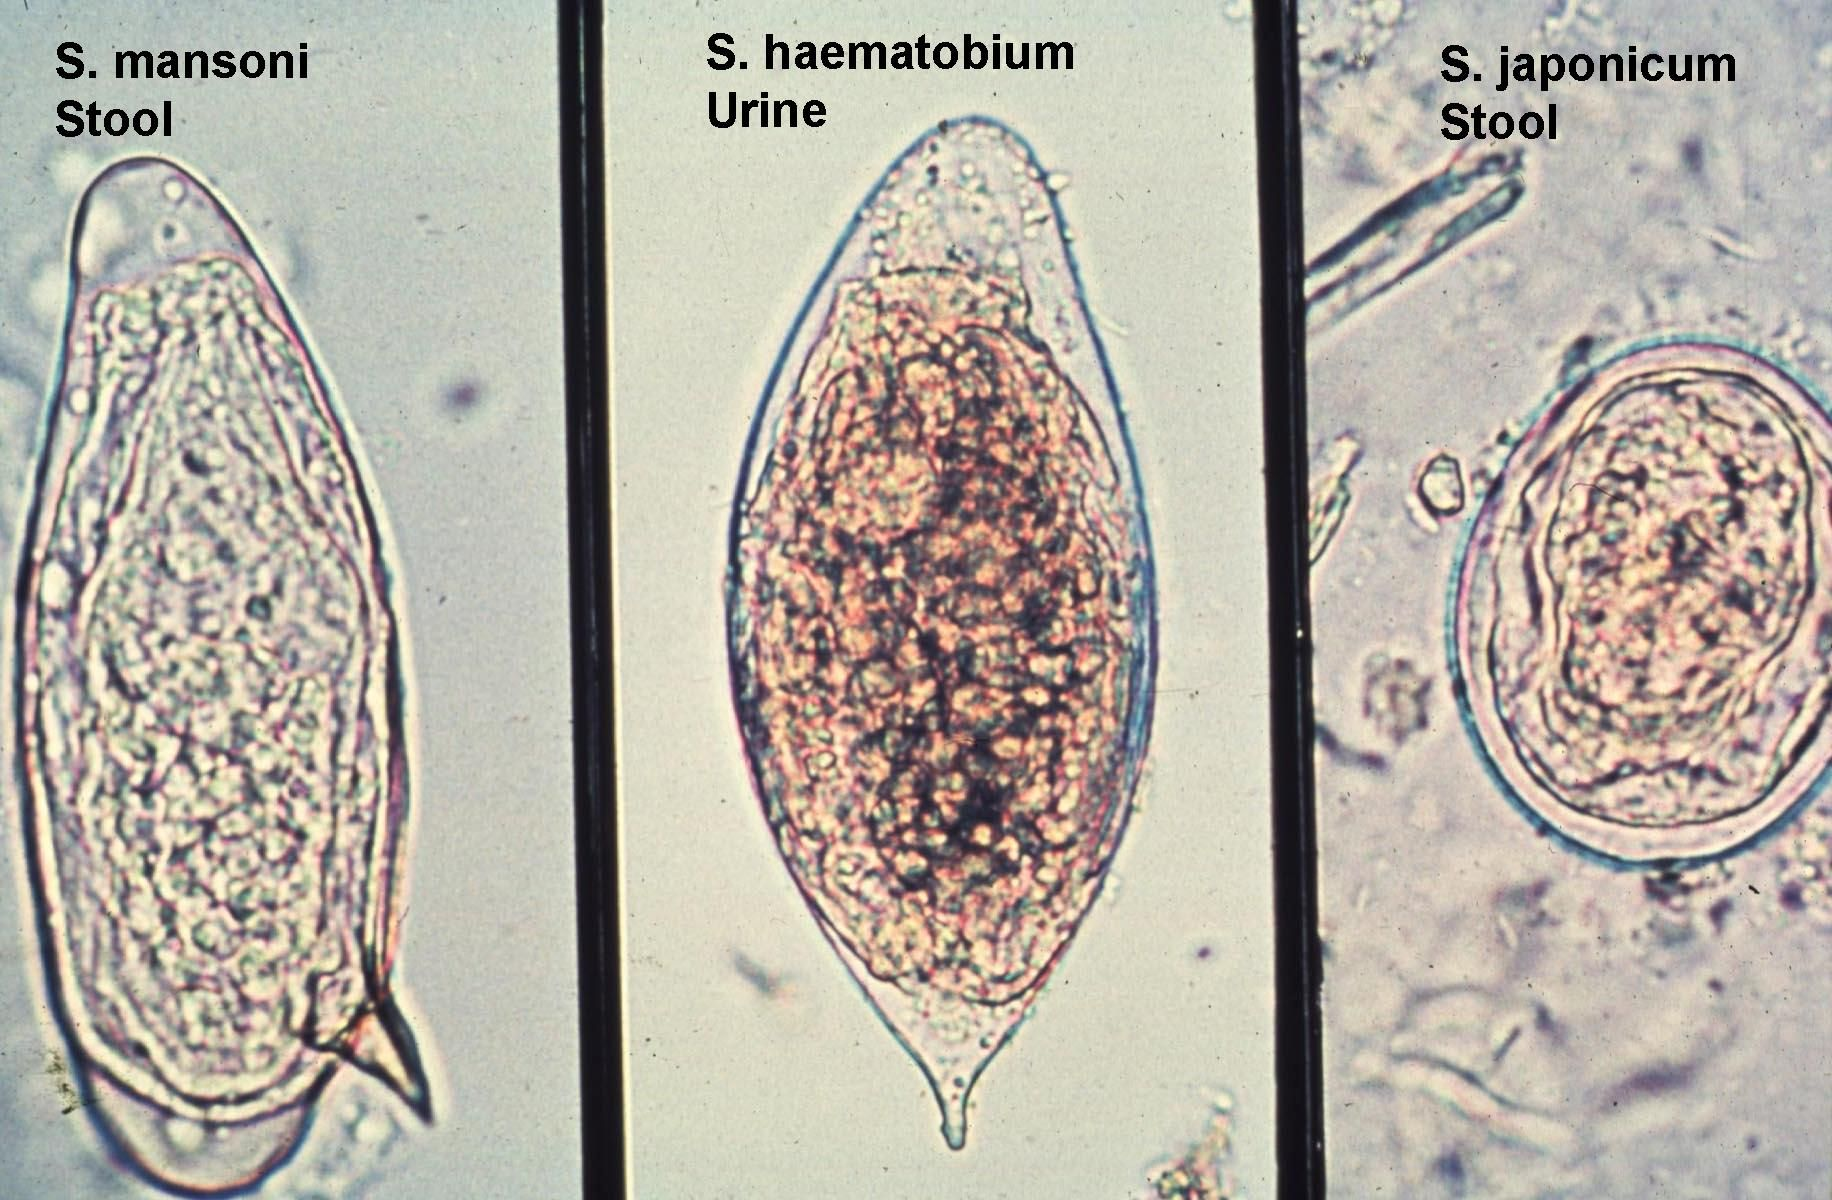 Types of schistosomiasis, Schistosomiasis types Papilloma of whartons duct